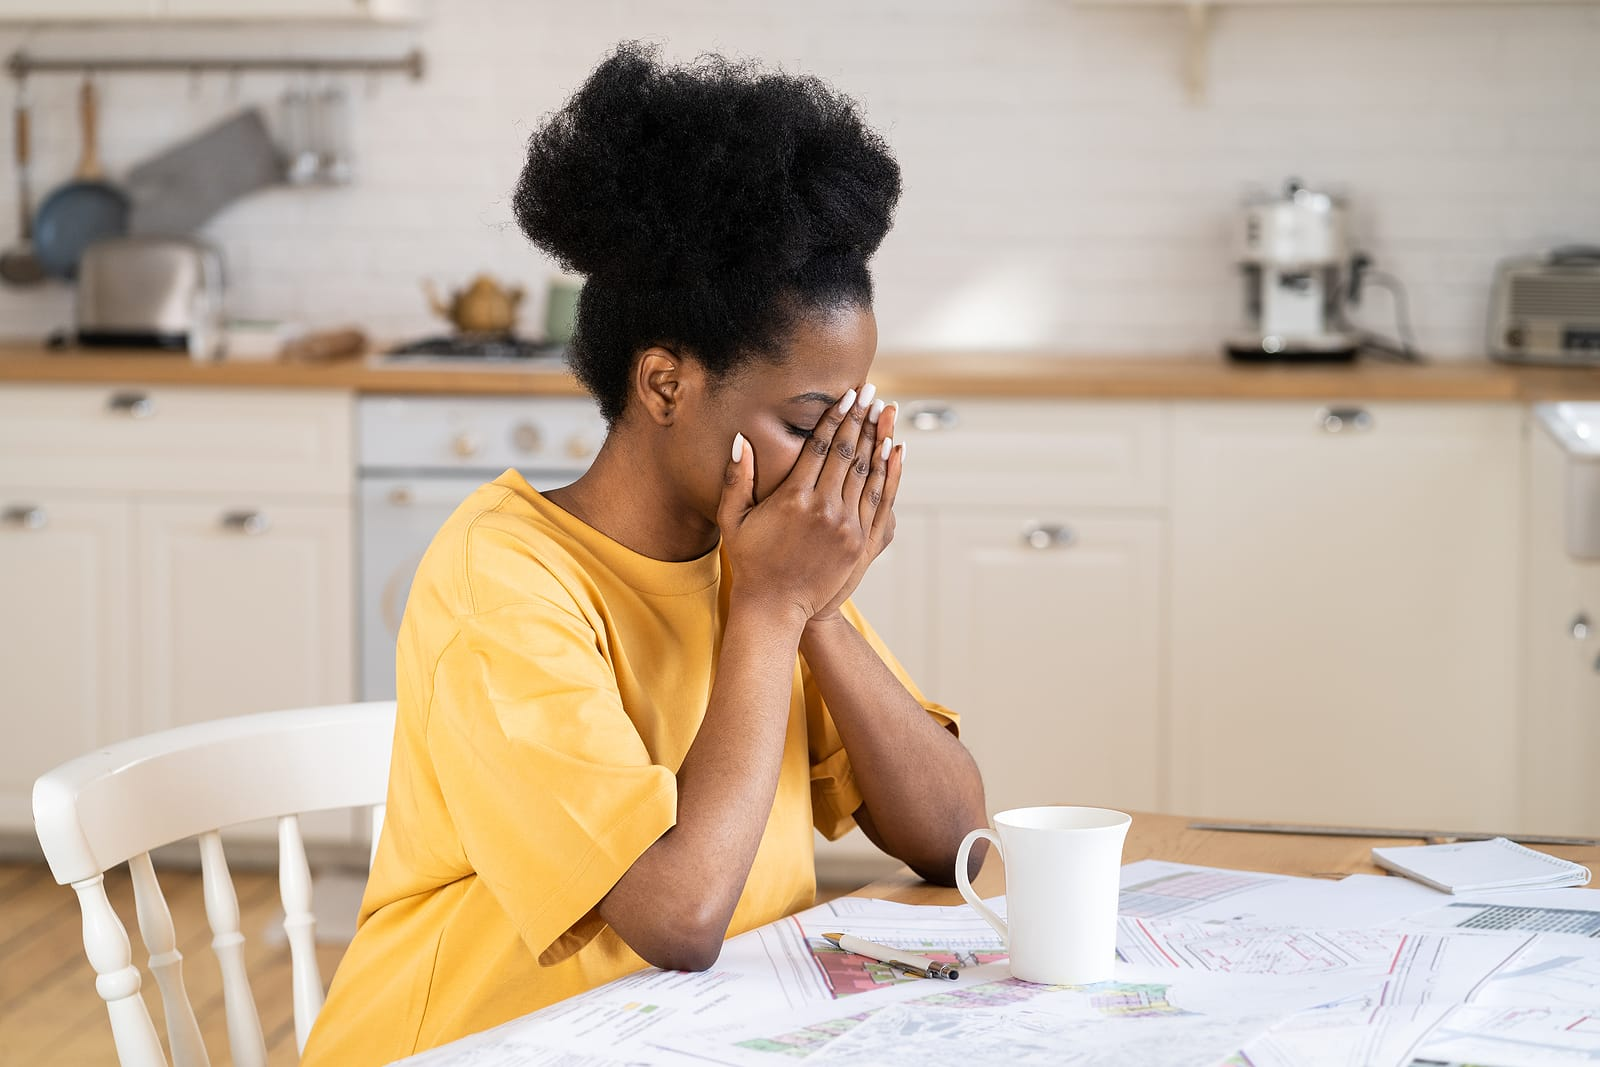 Is adrenal fatigue real? Dr. Lewis explains